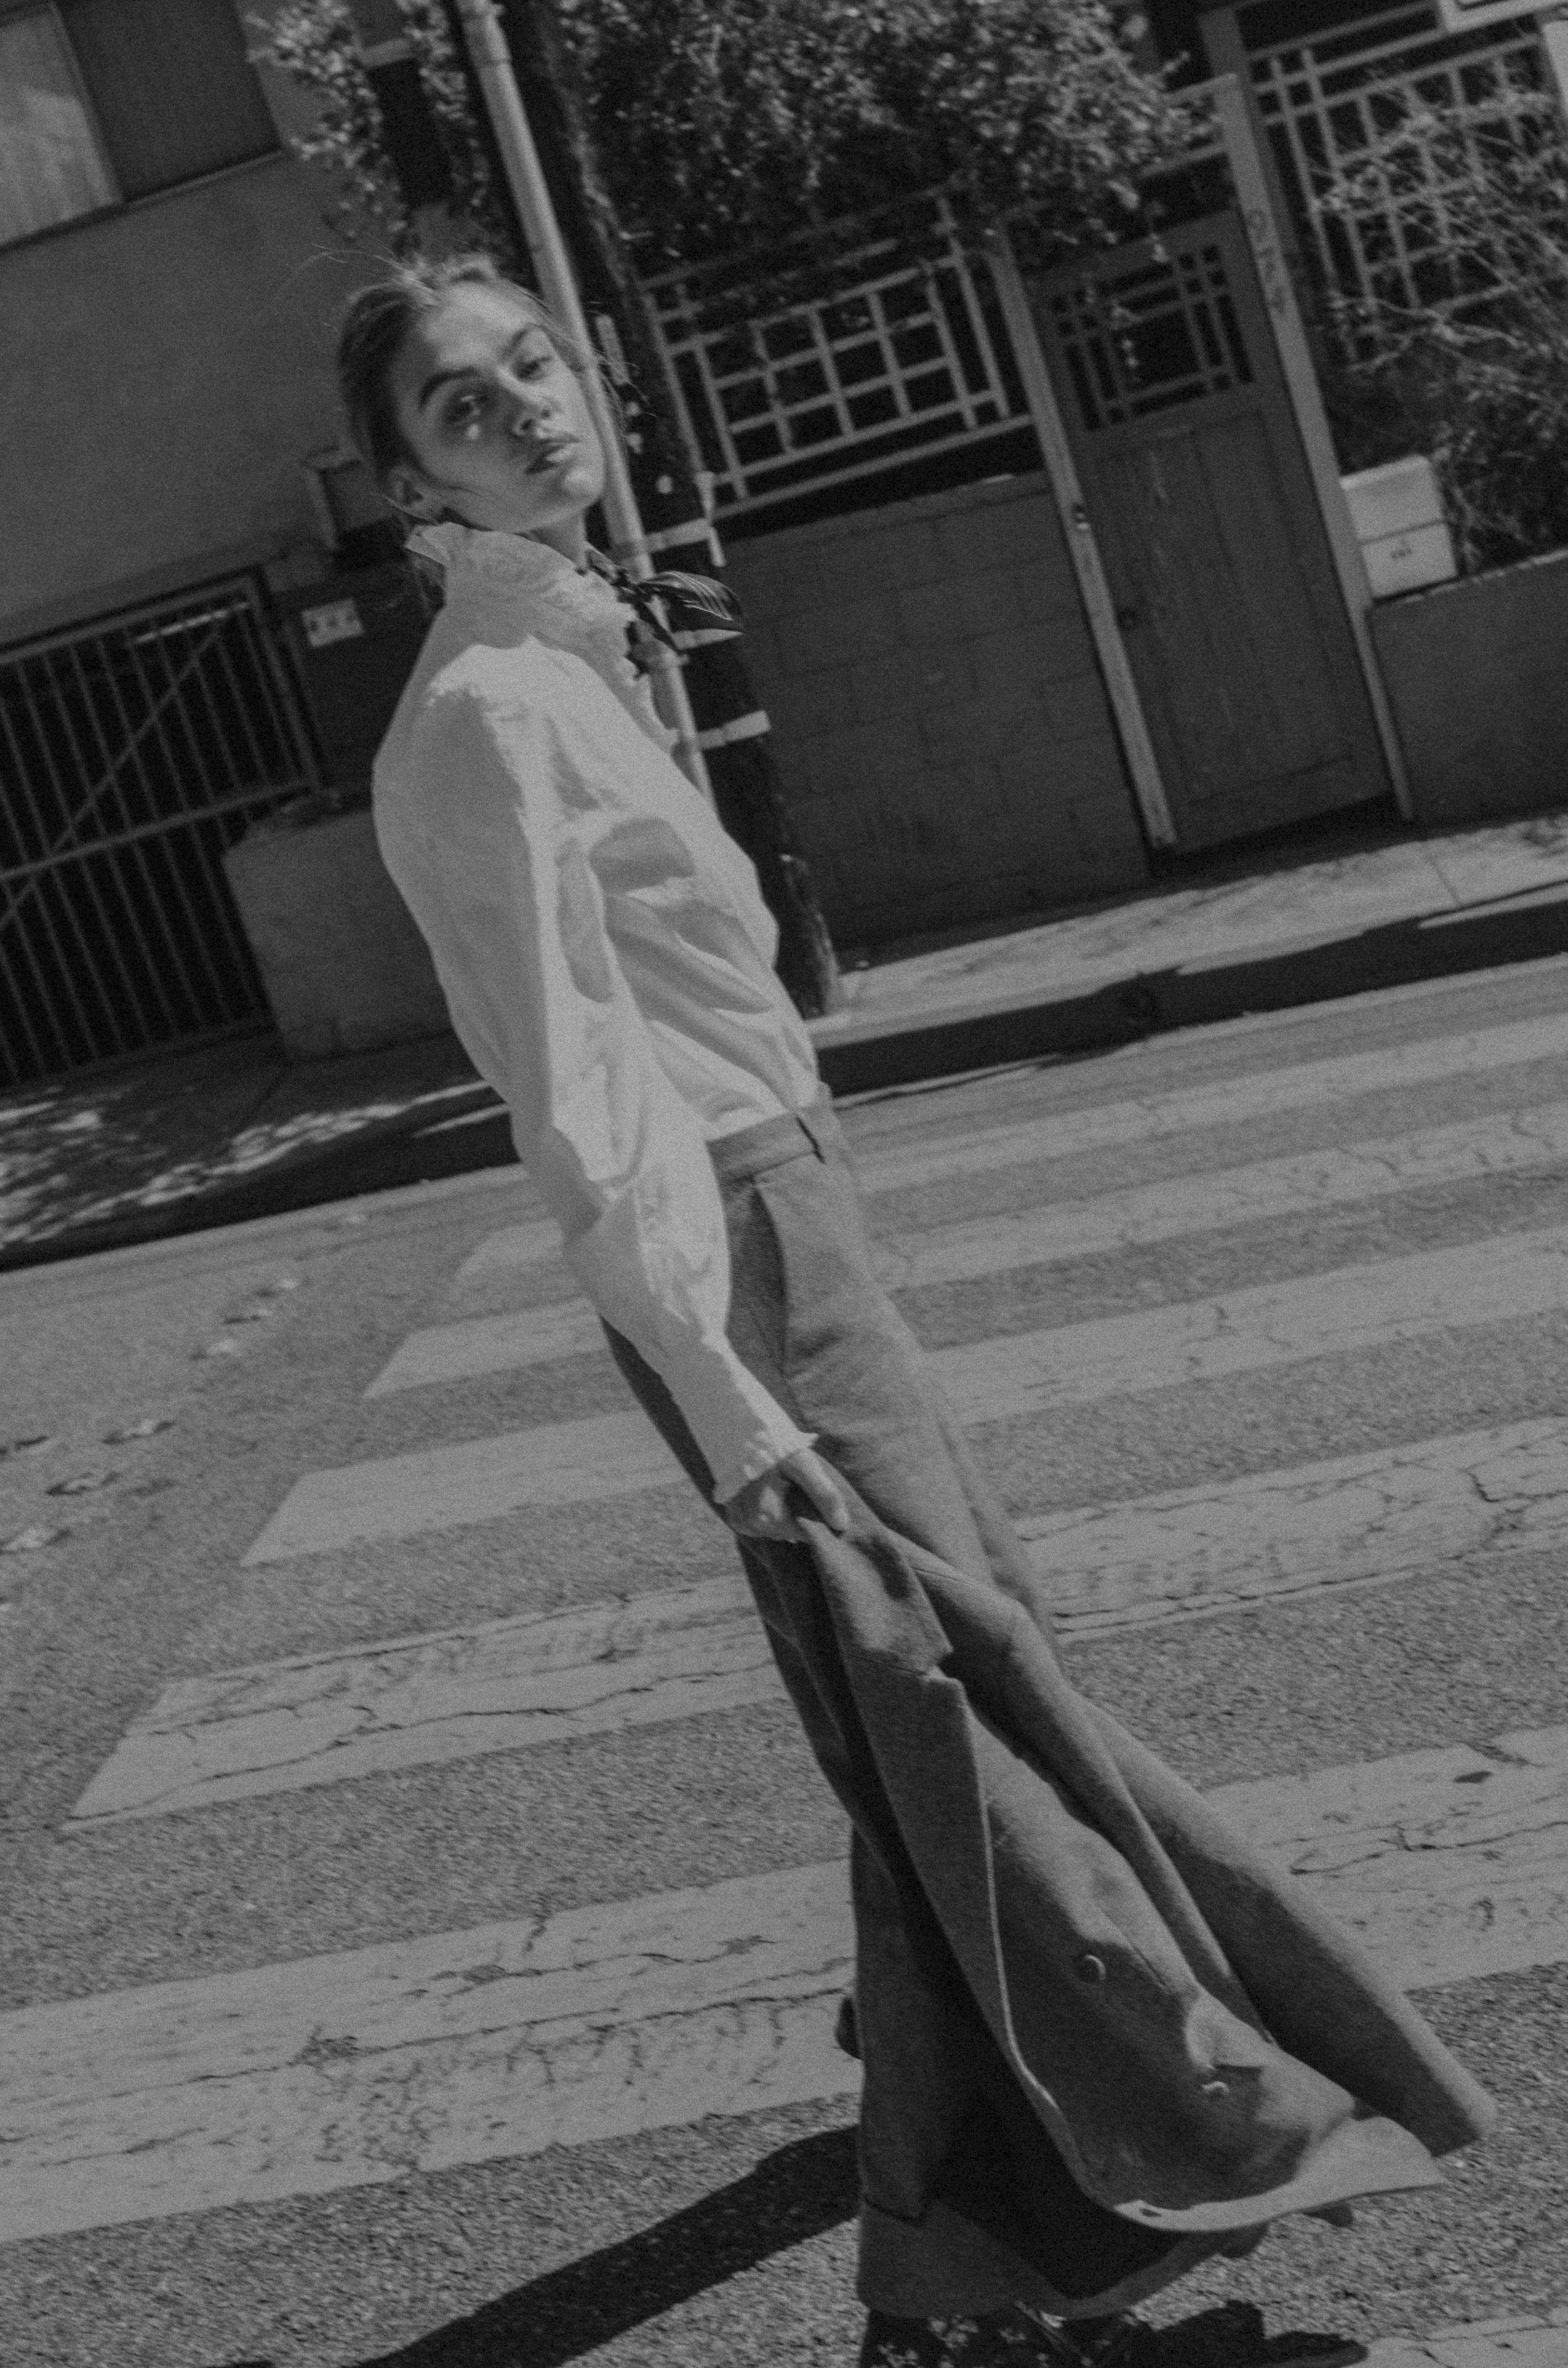 Photographed by Cibelle Levi for Ederm x H&M